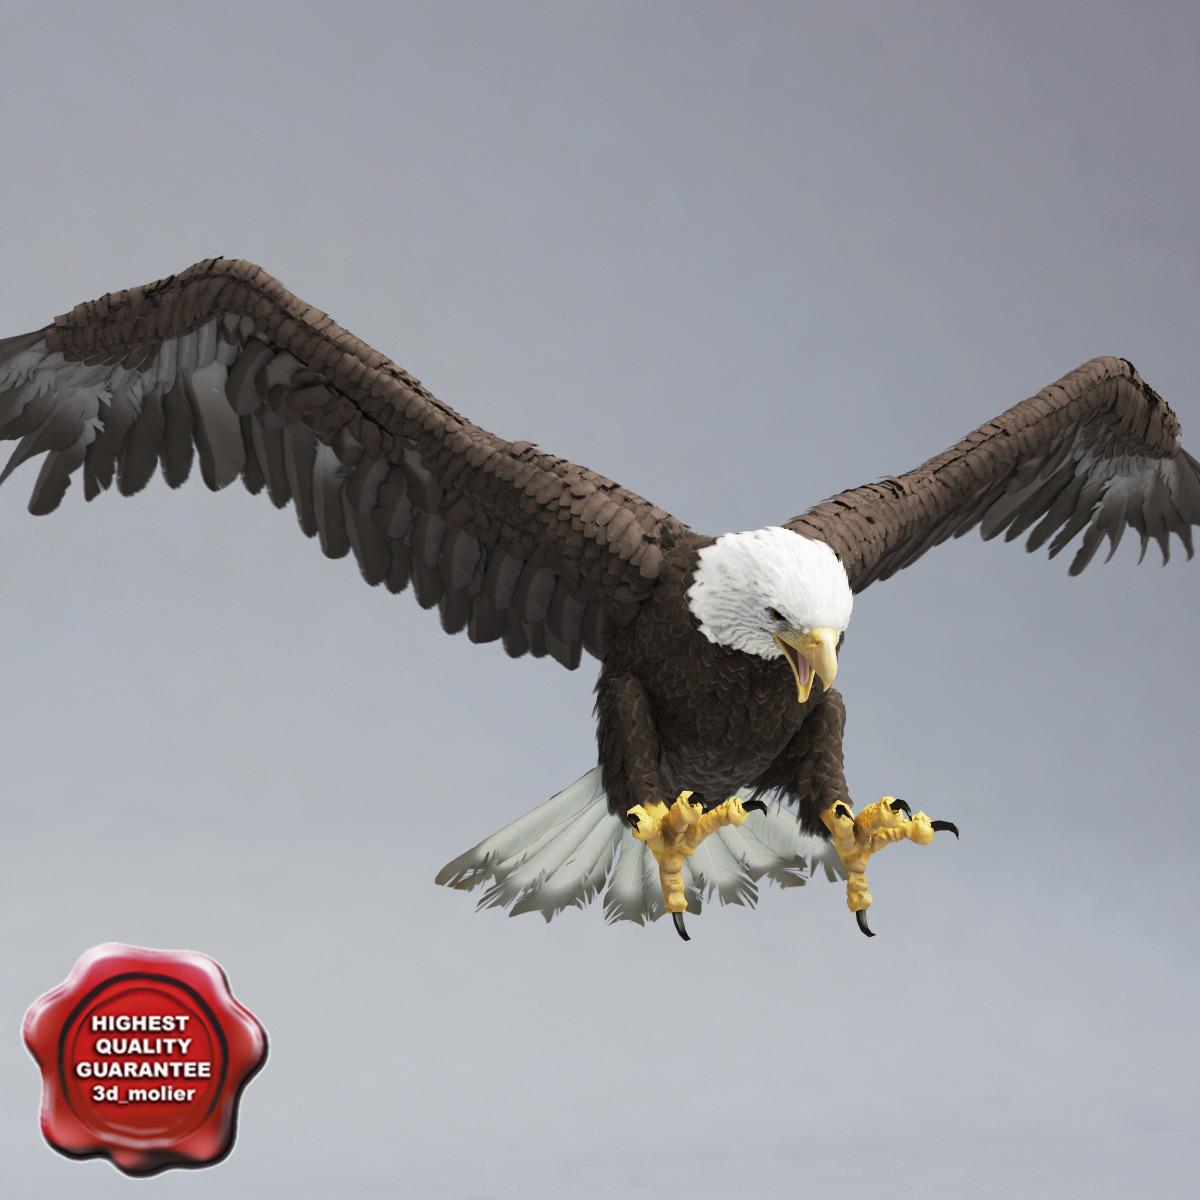 Bald_Eagle_Pose4_00.jpg